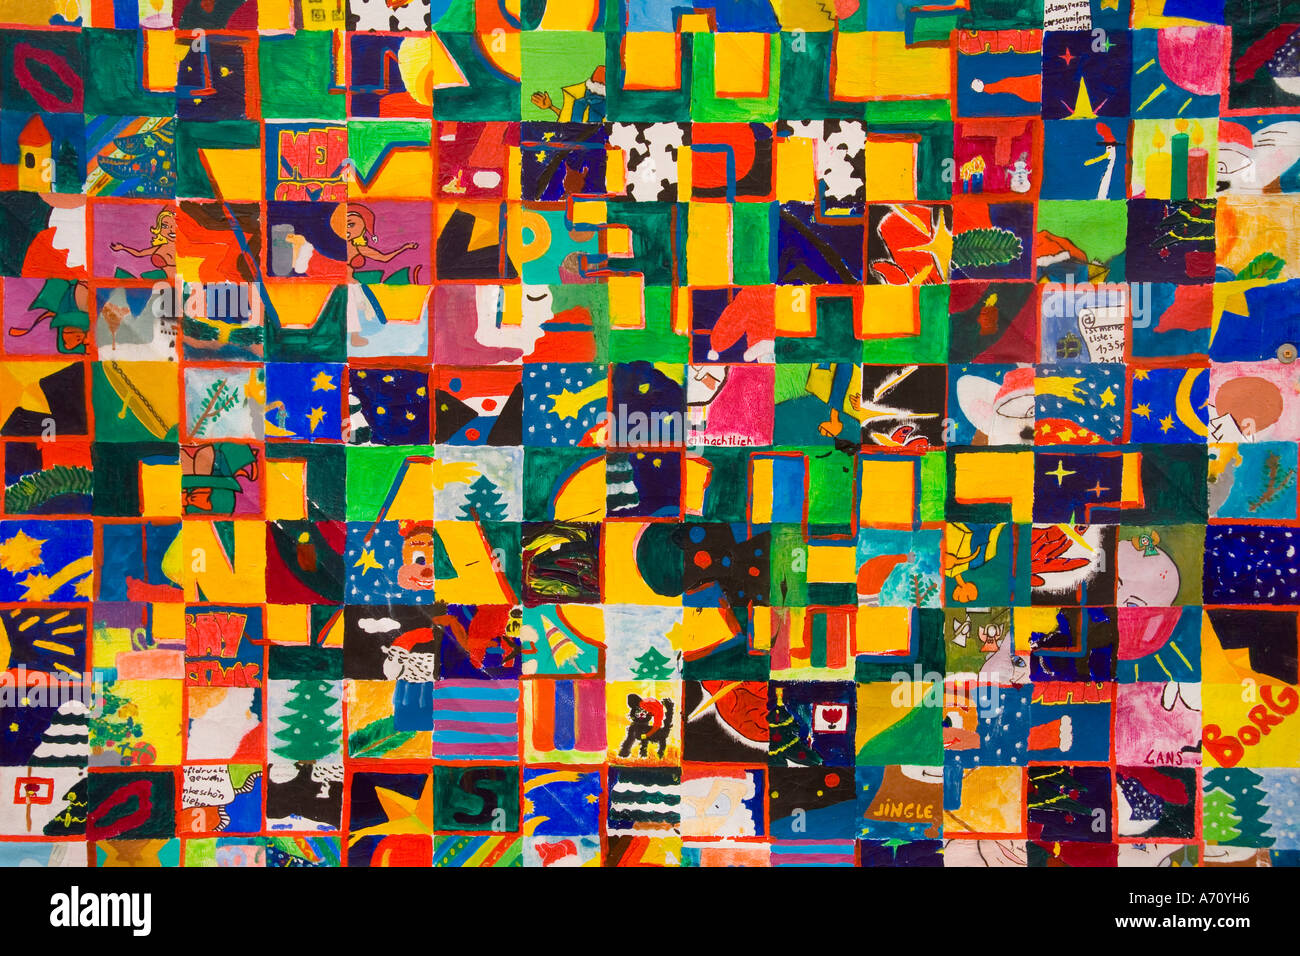 Mosaic paint (X_mas) from child - Stock Image